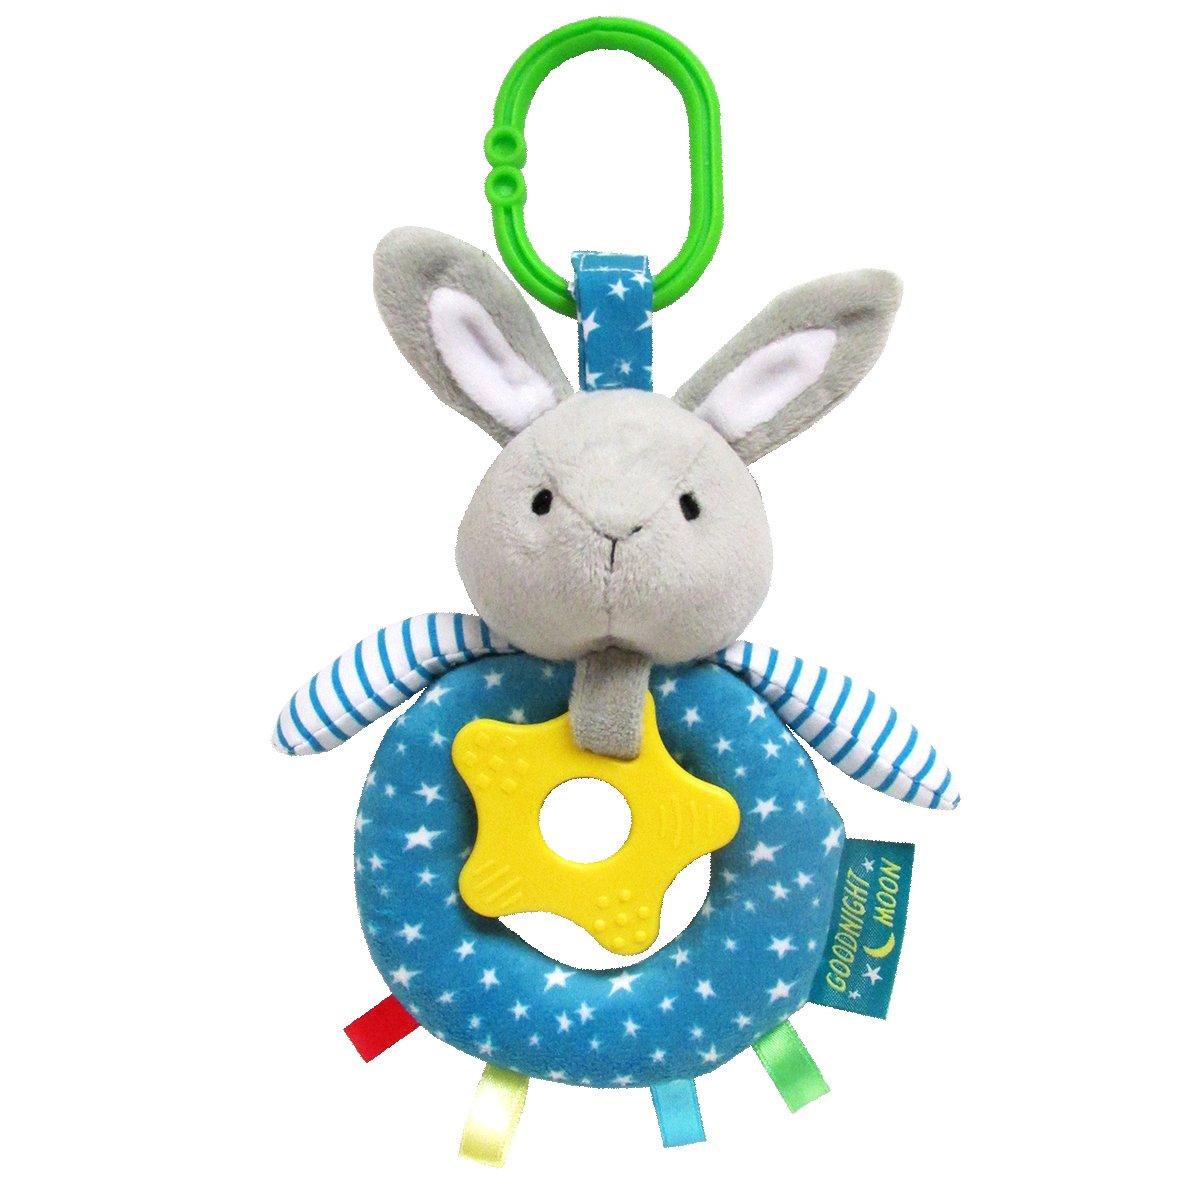 Kids Preferred Goodnight Moon Baby Toy, Pajama Bunny Beanbag 33359